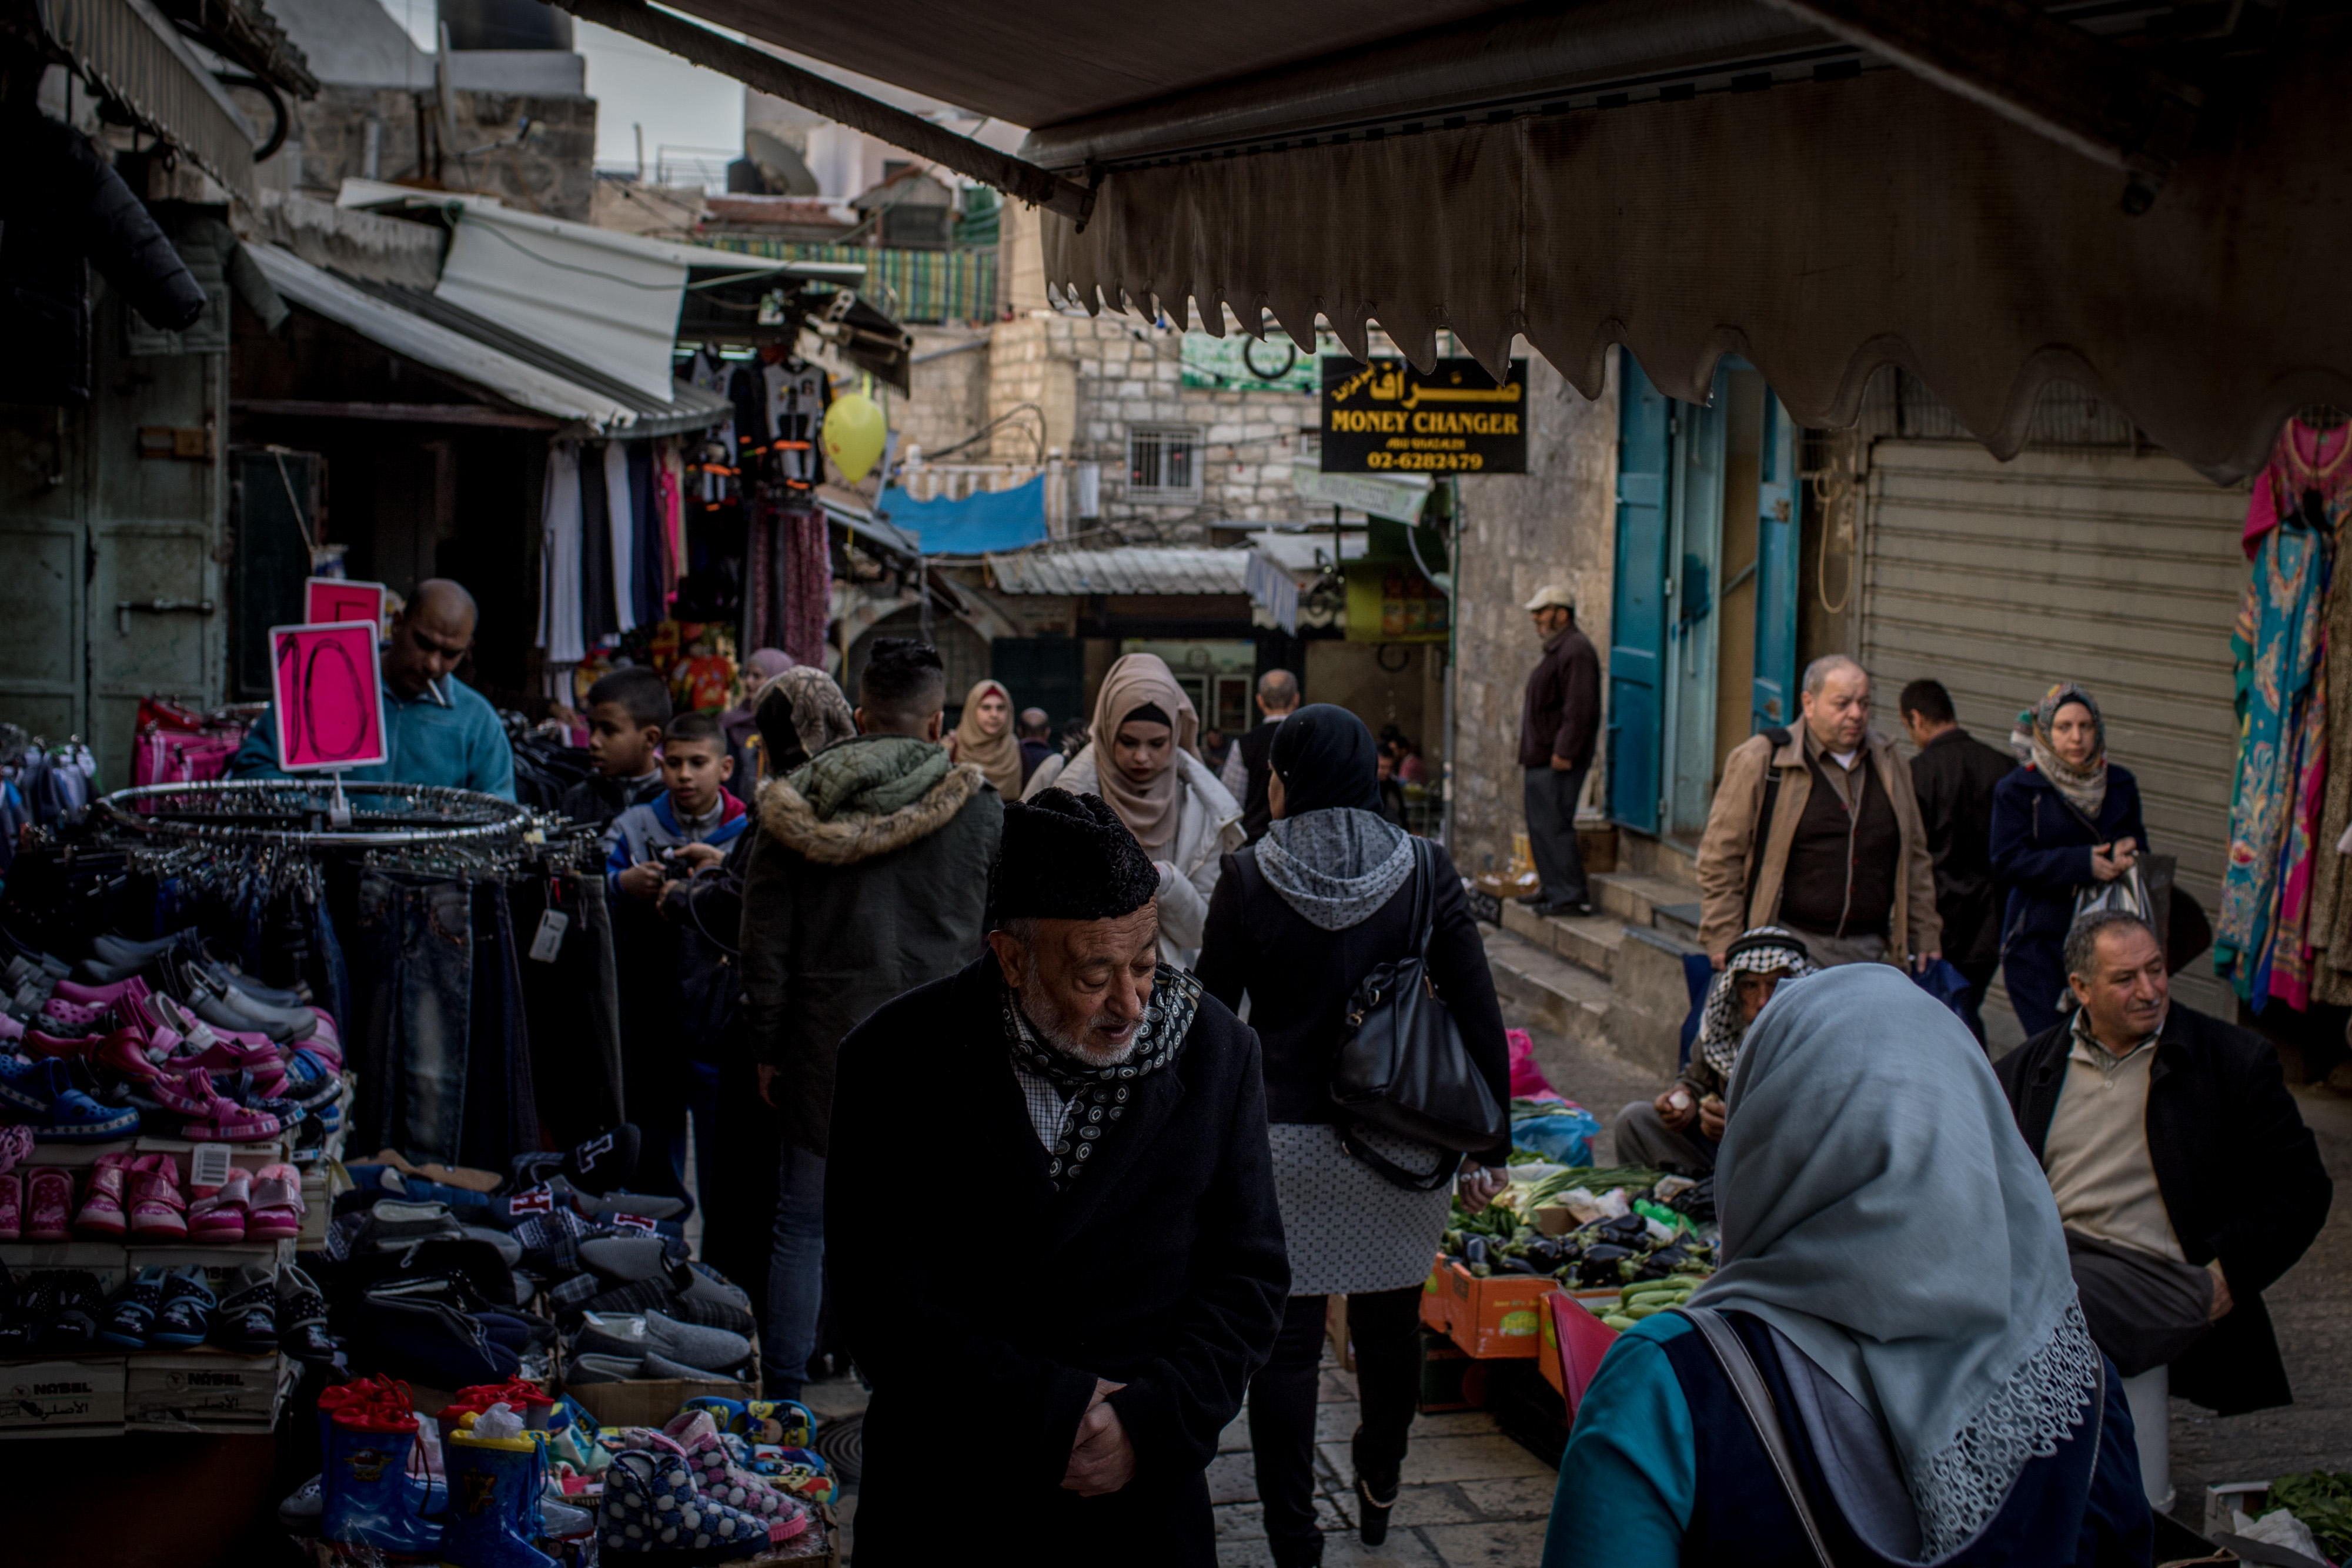 People shop in the Muslim Quarter of the Old City on December 10, 2017 in Jerusalem, Israel.